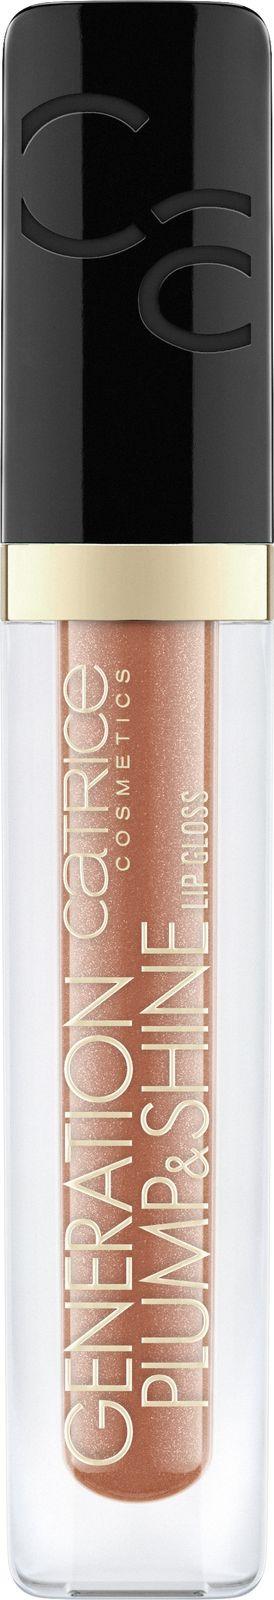 Блеск для губ Catrice Generation Plump & Shine Lip Gloss , 100 Glowing Tourmaline